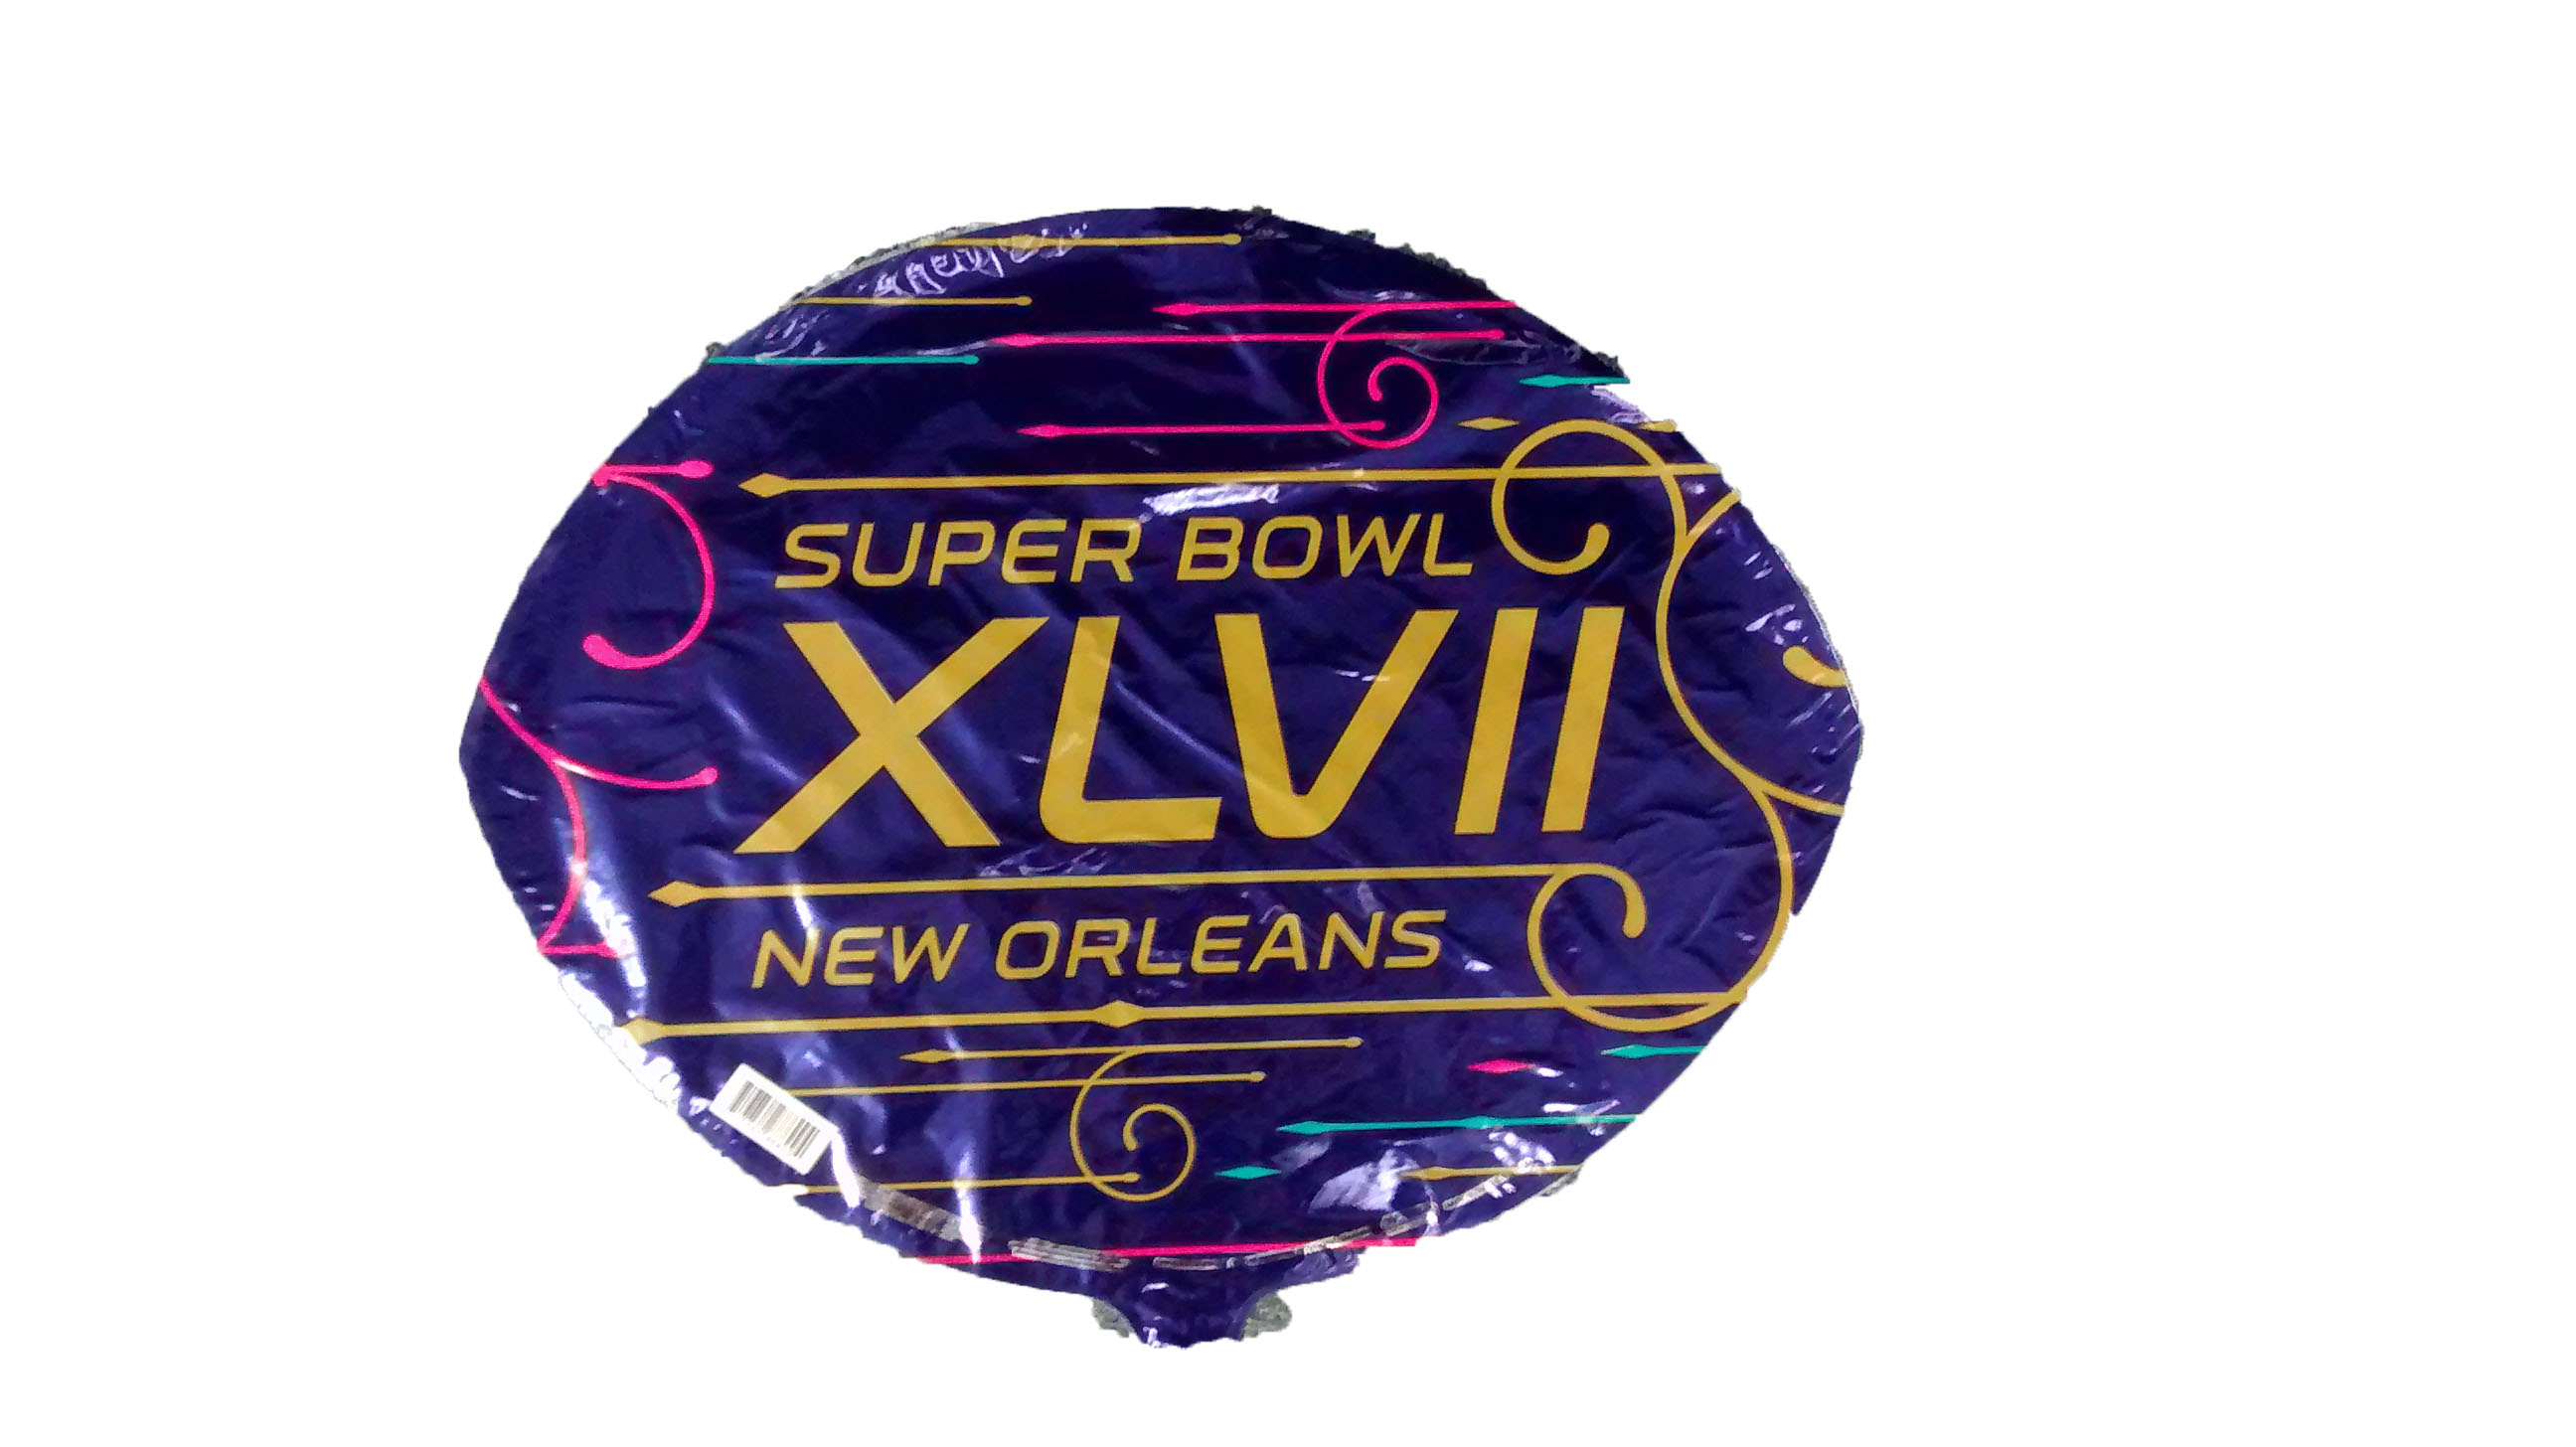 "18"" Super Bowl XLVII New Orleans Purple Balloon"